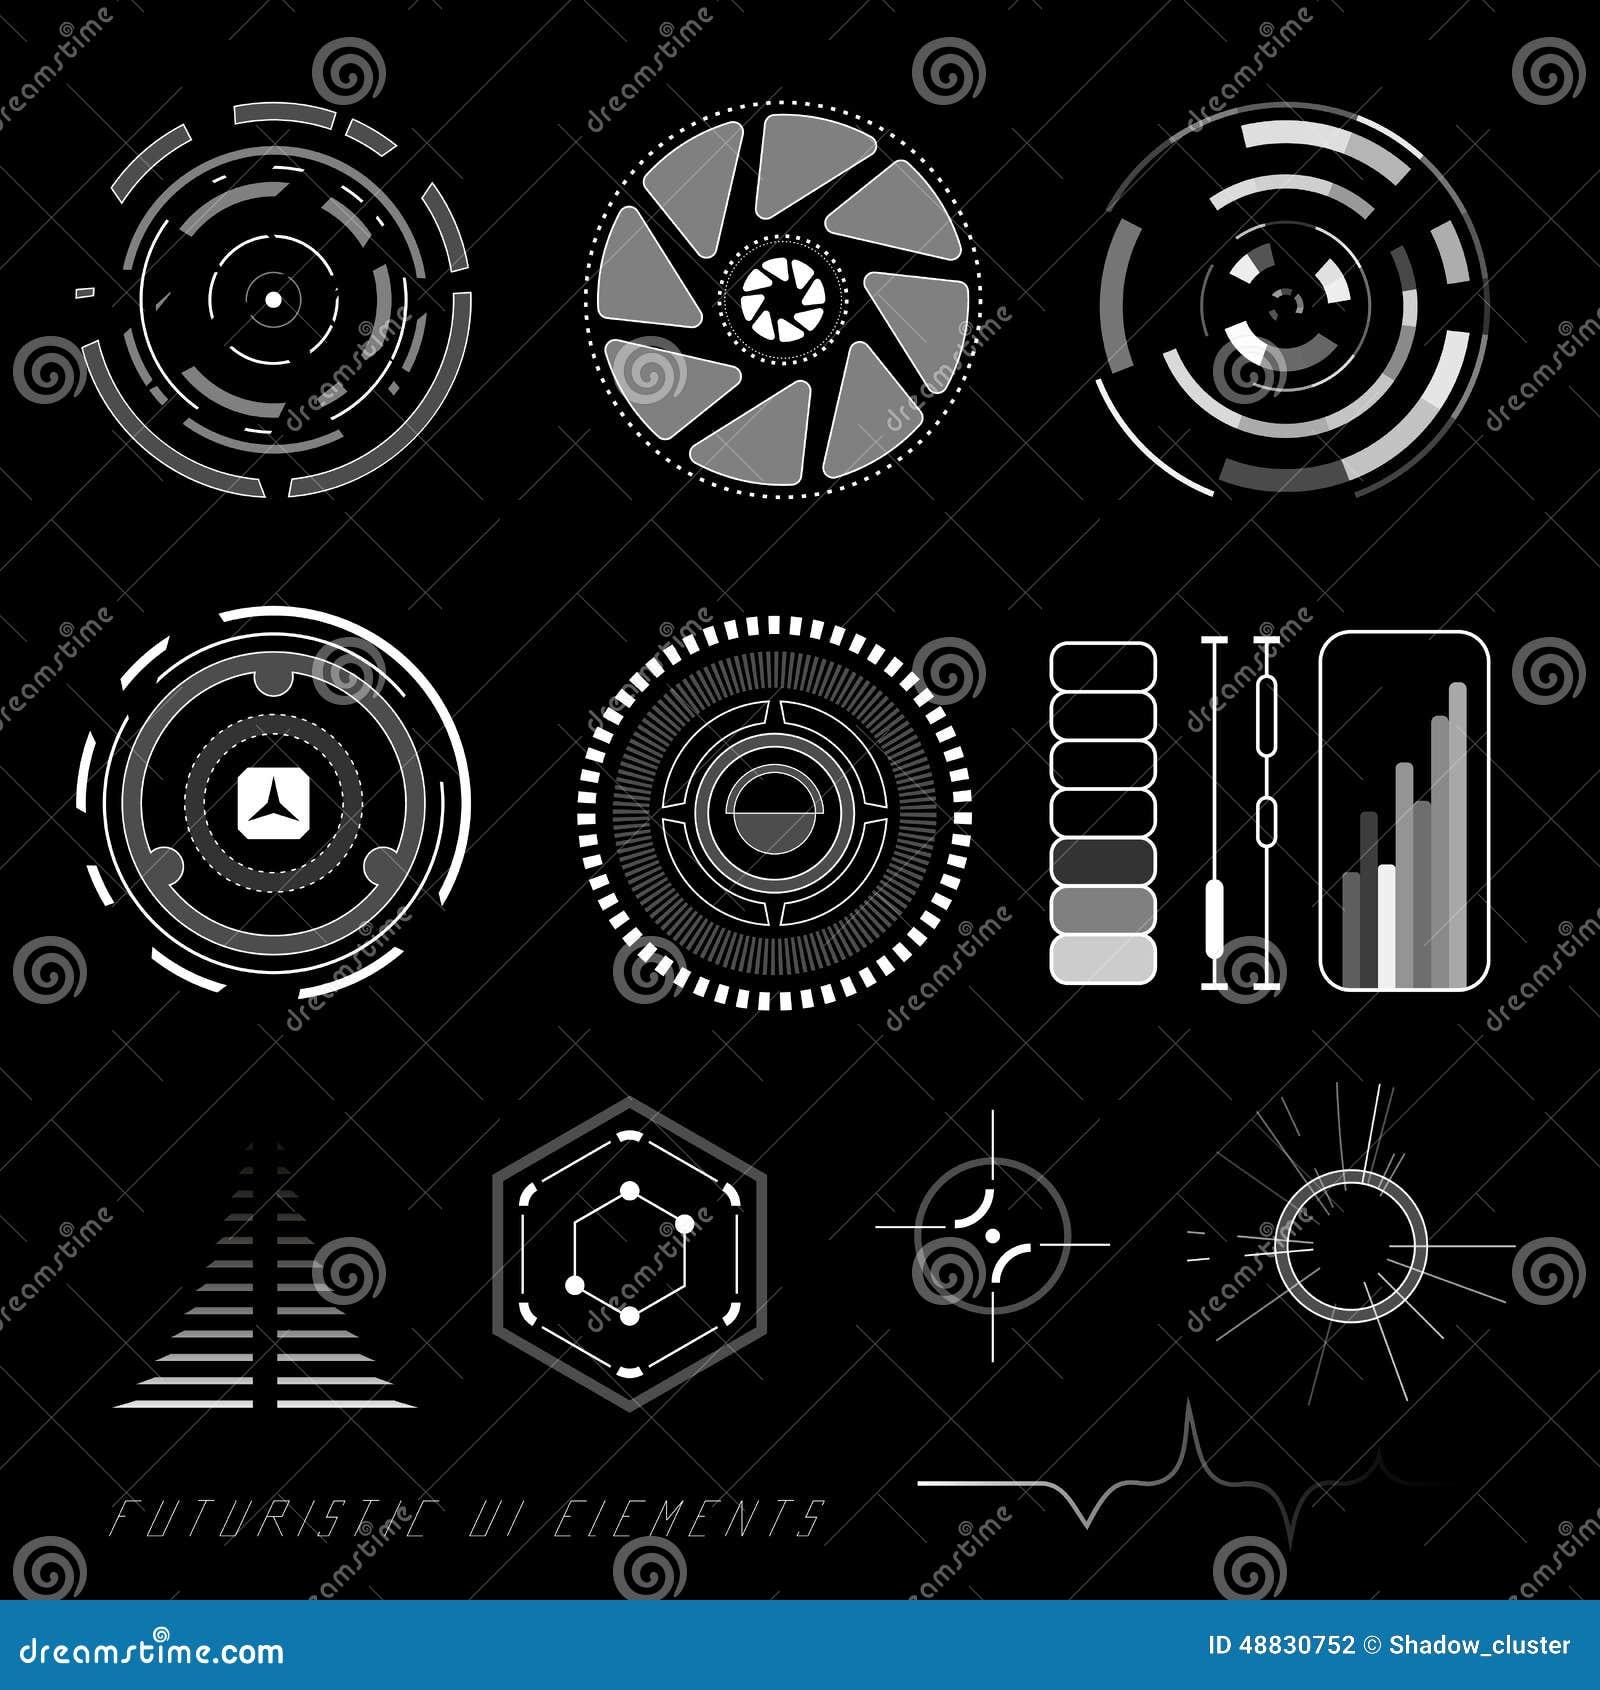 user interface element